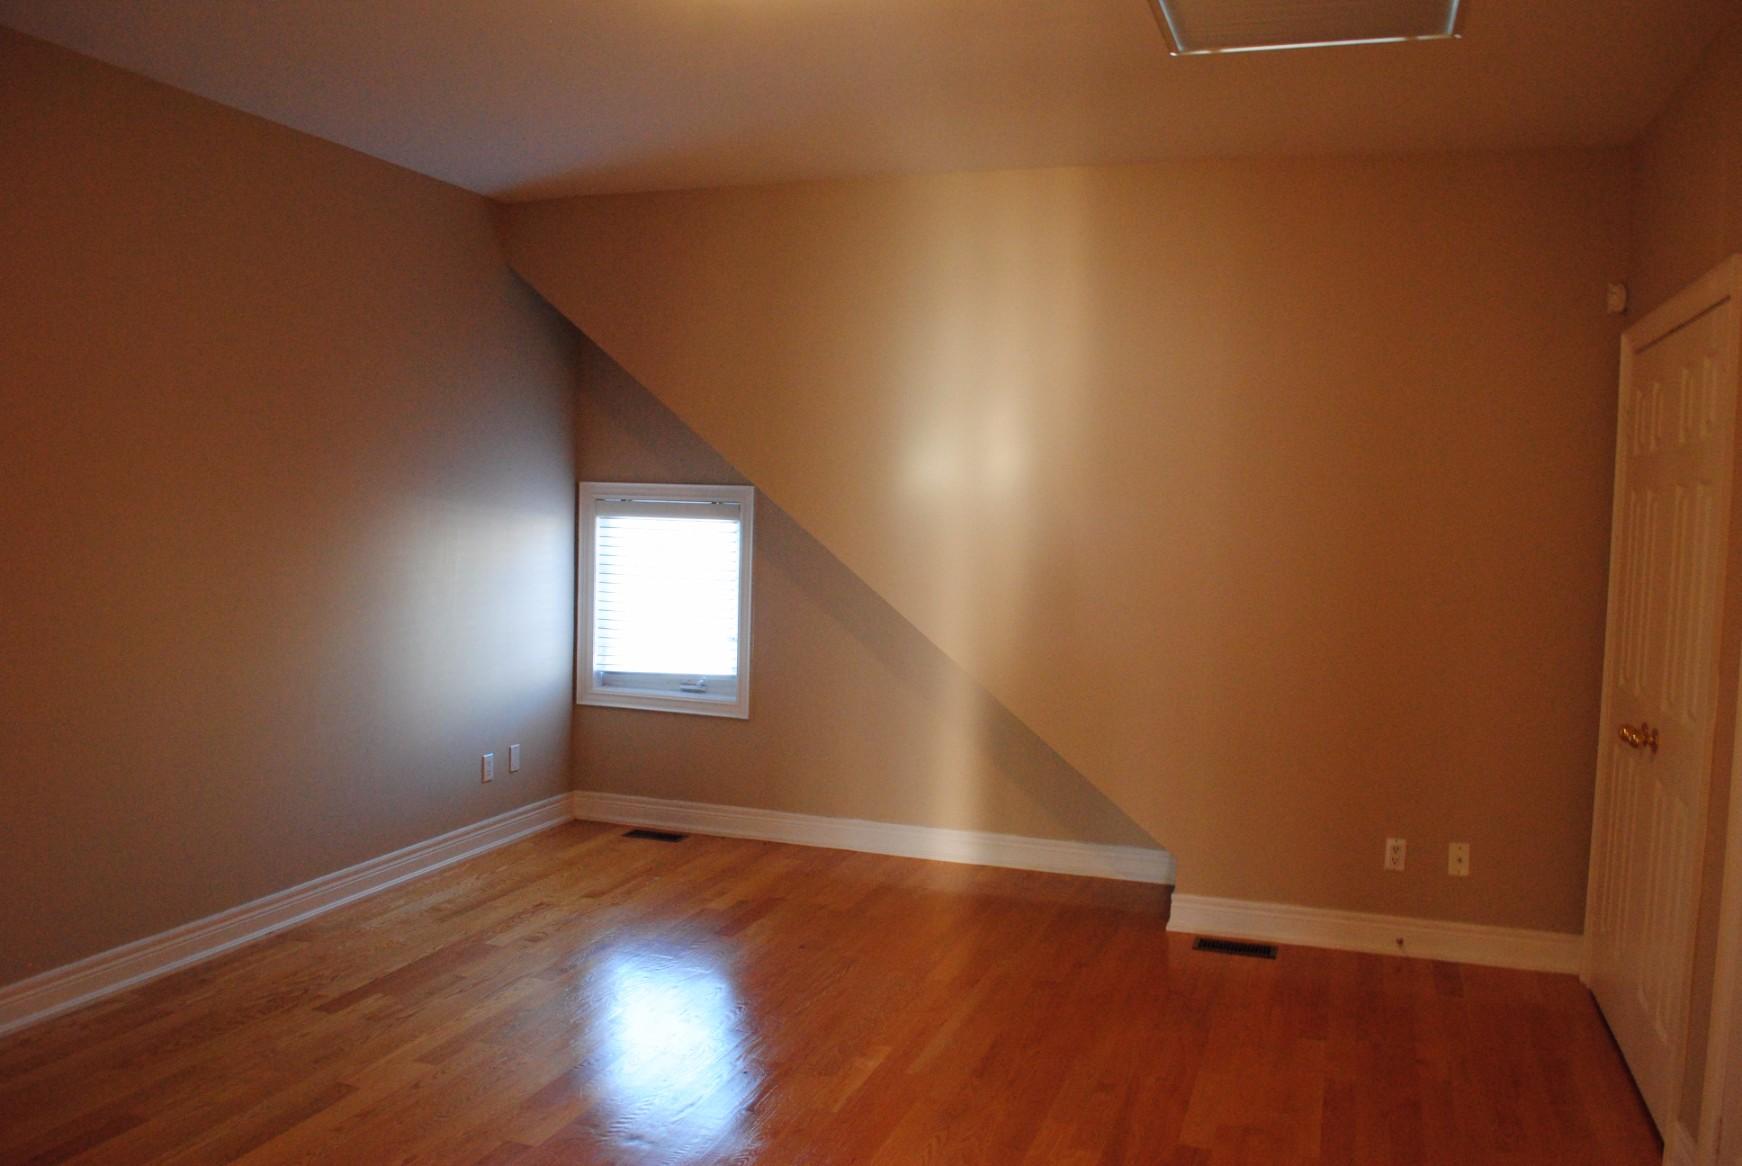 3 Craftsman Lane,Toronto,3 Bedrooms Bedrooms,2 BathroomsBathrooms,Townhouse,Craftsman Lane,1008